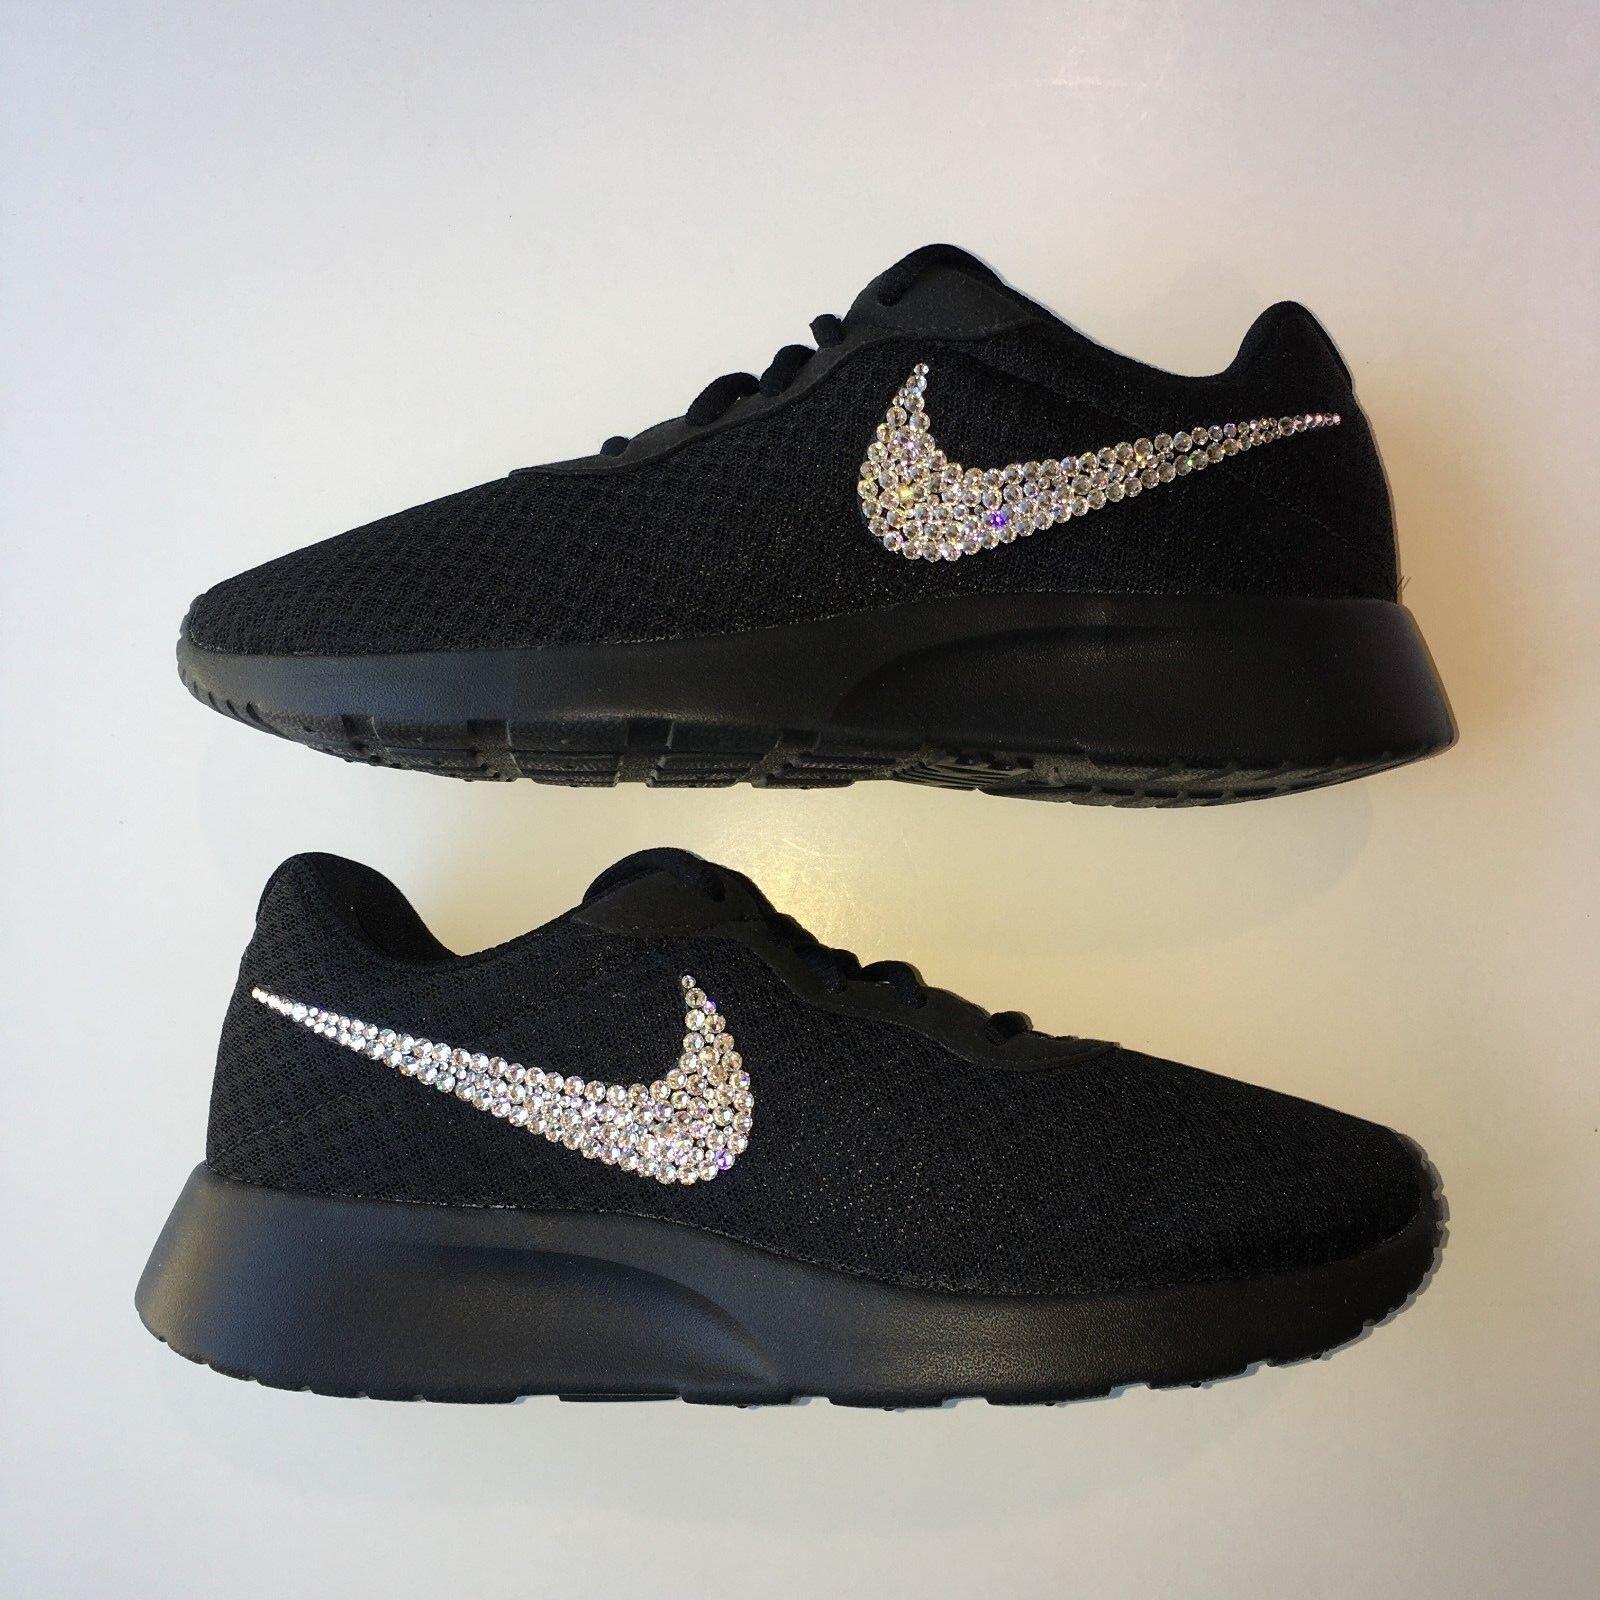 Bling Nike Nike Nike Tanjun scarpe with Swarovski Crystal Diamond Rhinestone - nero 024085